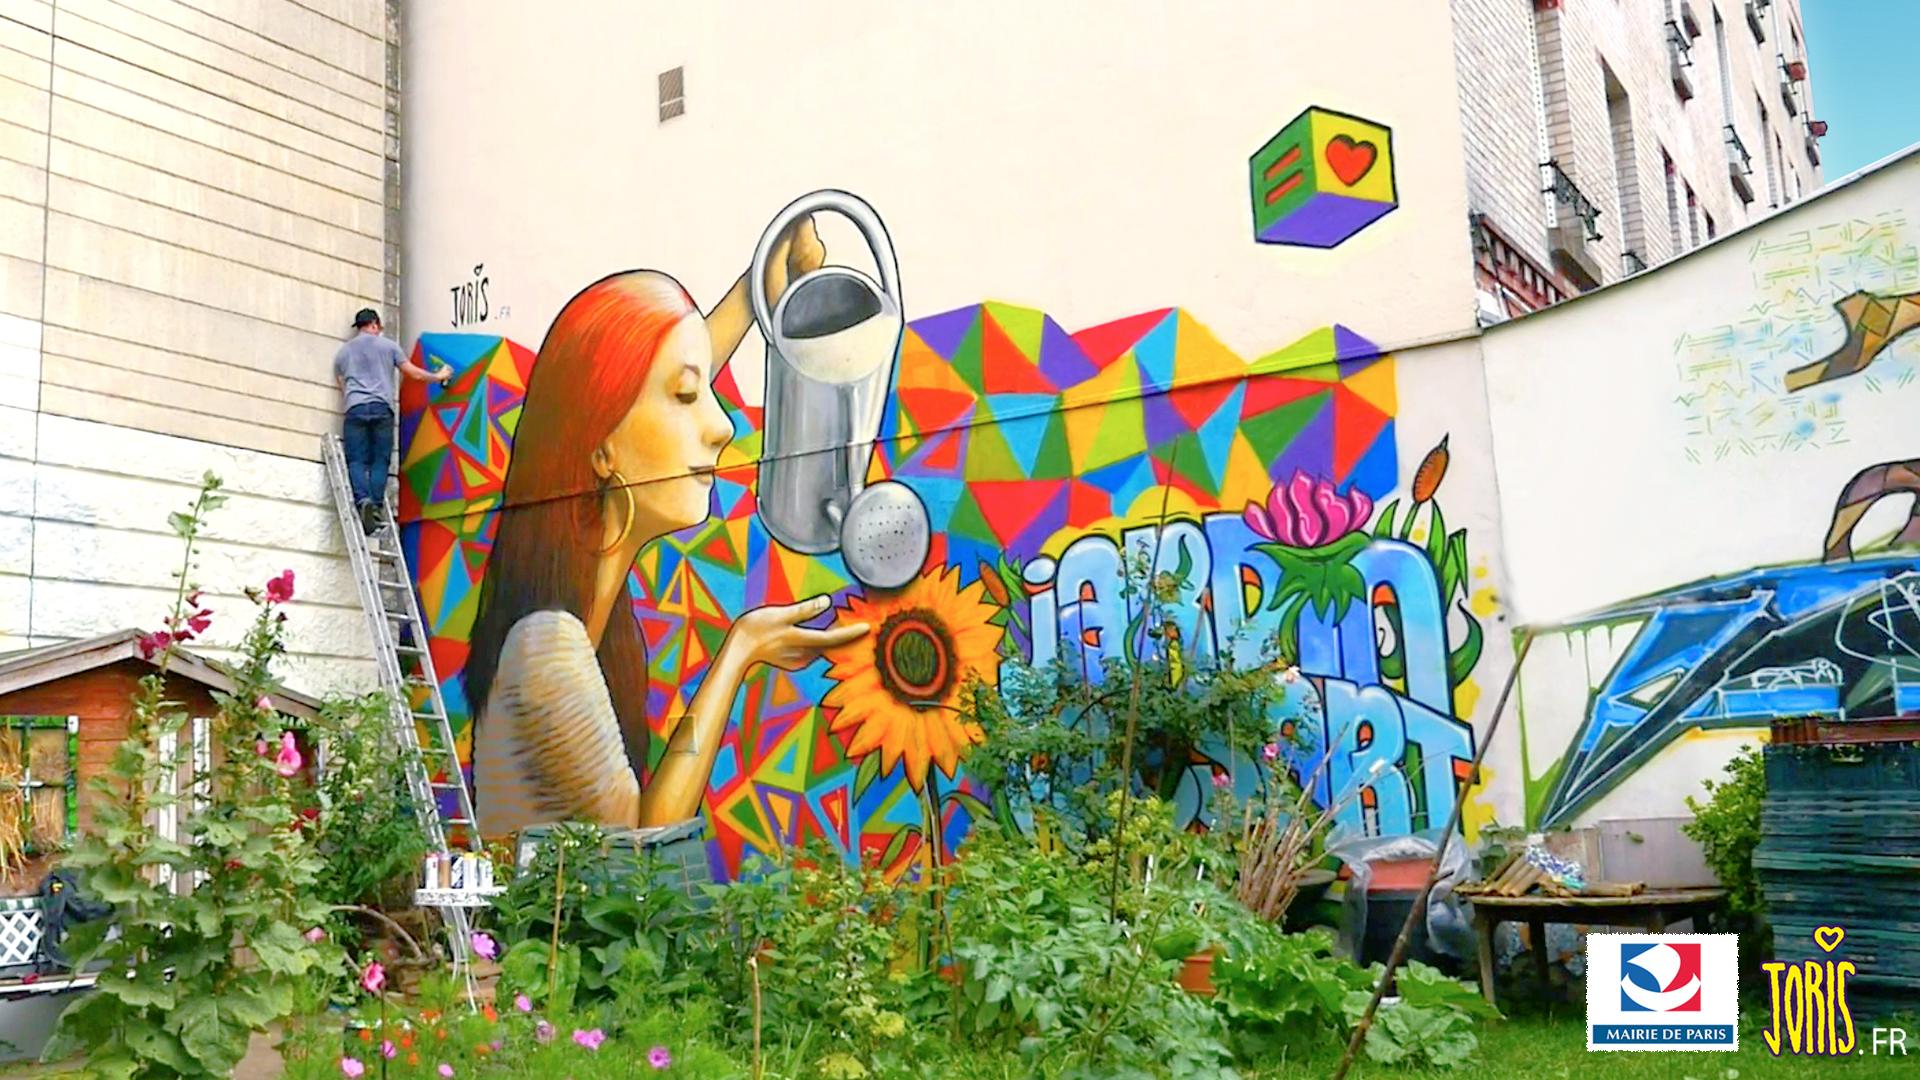 DECORATION-GRAFFITI-FRESQUE-TABLEAU-STREET-ART-PARIS-29